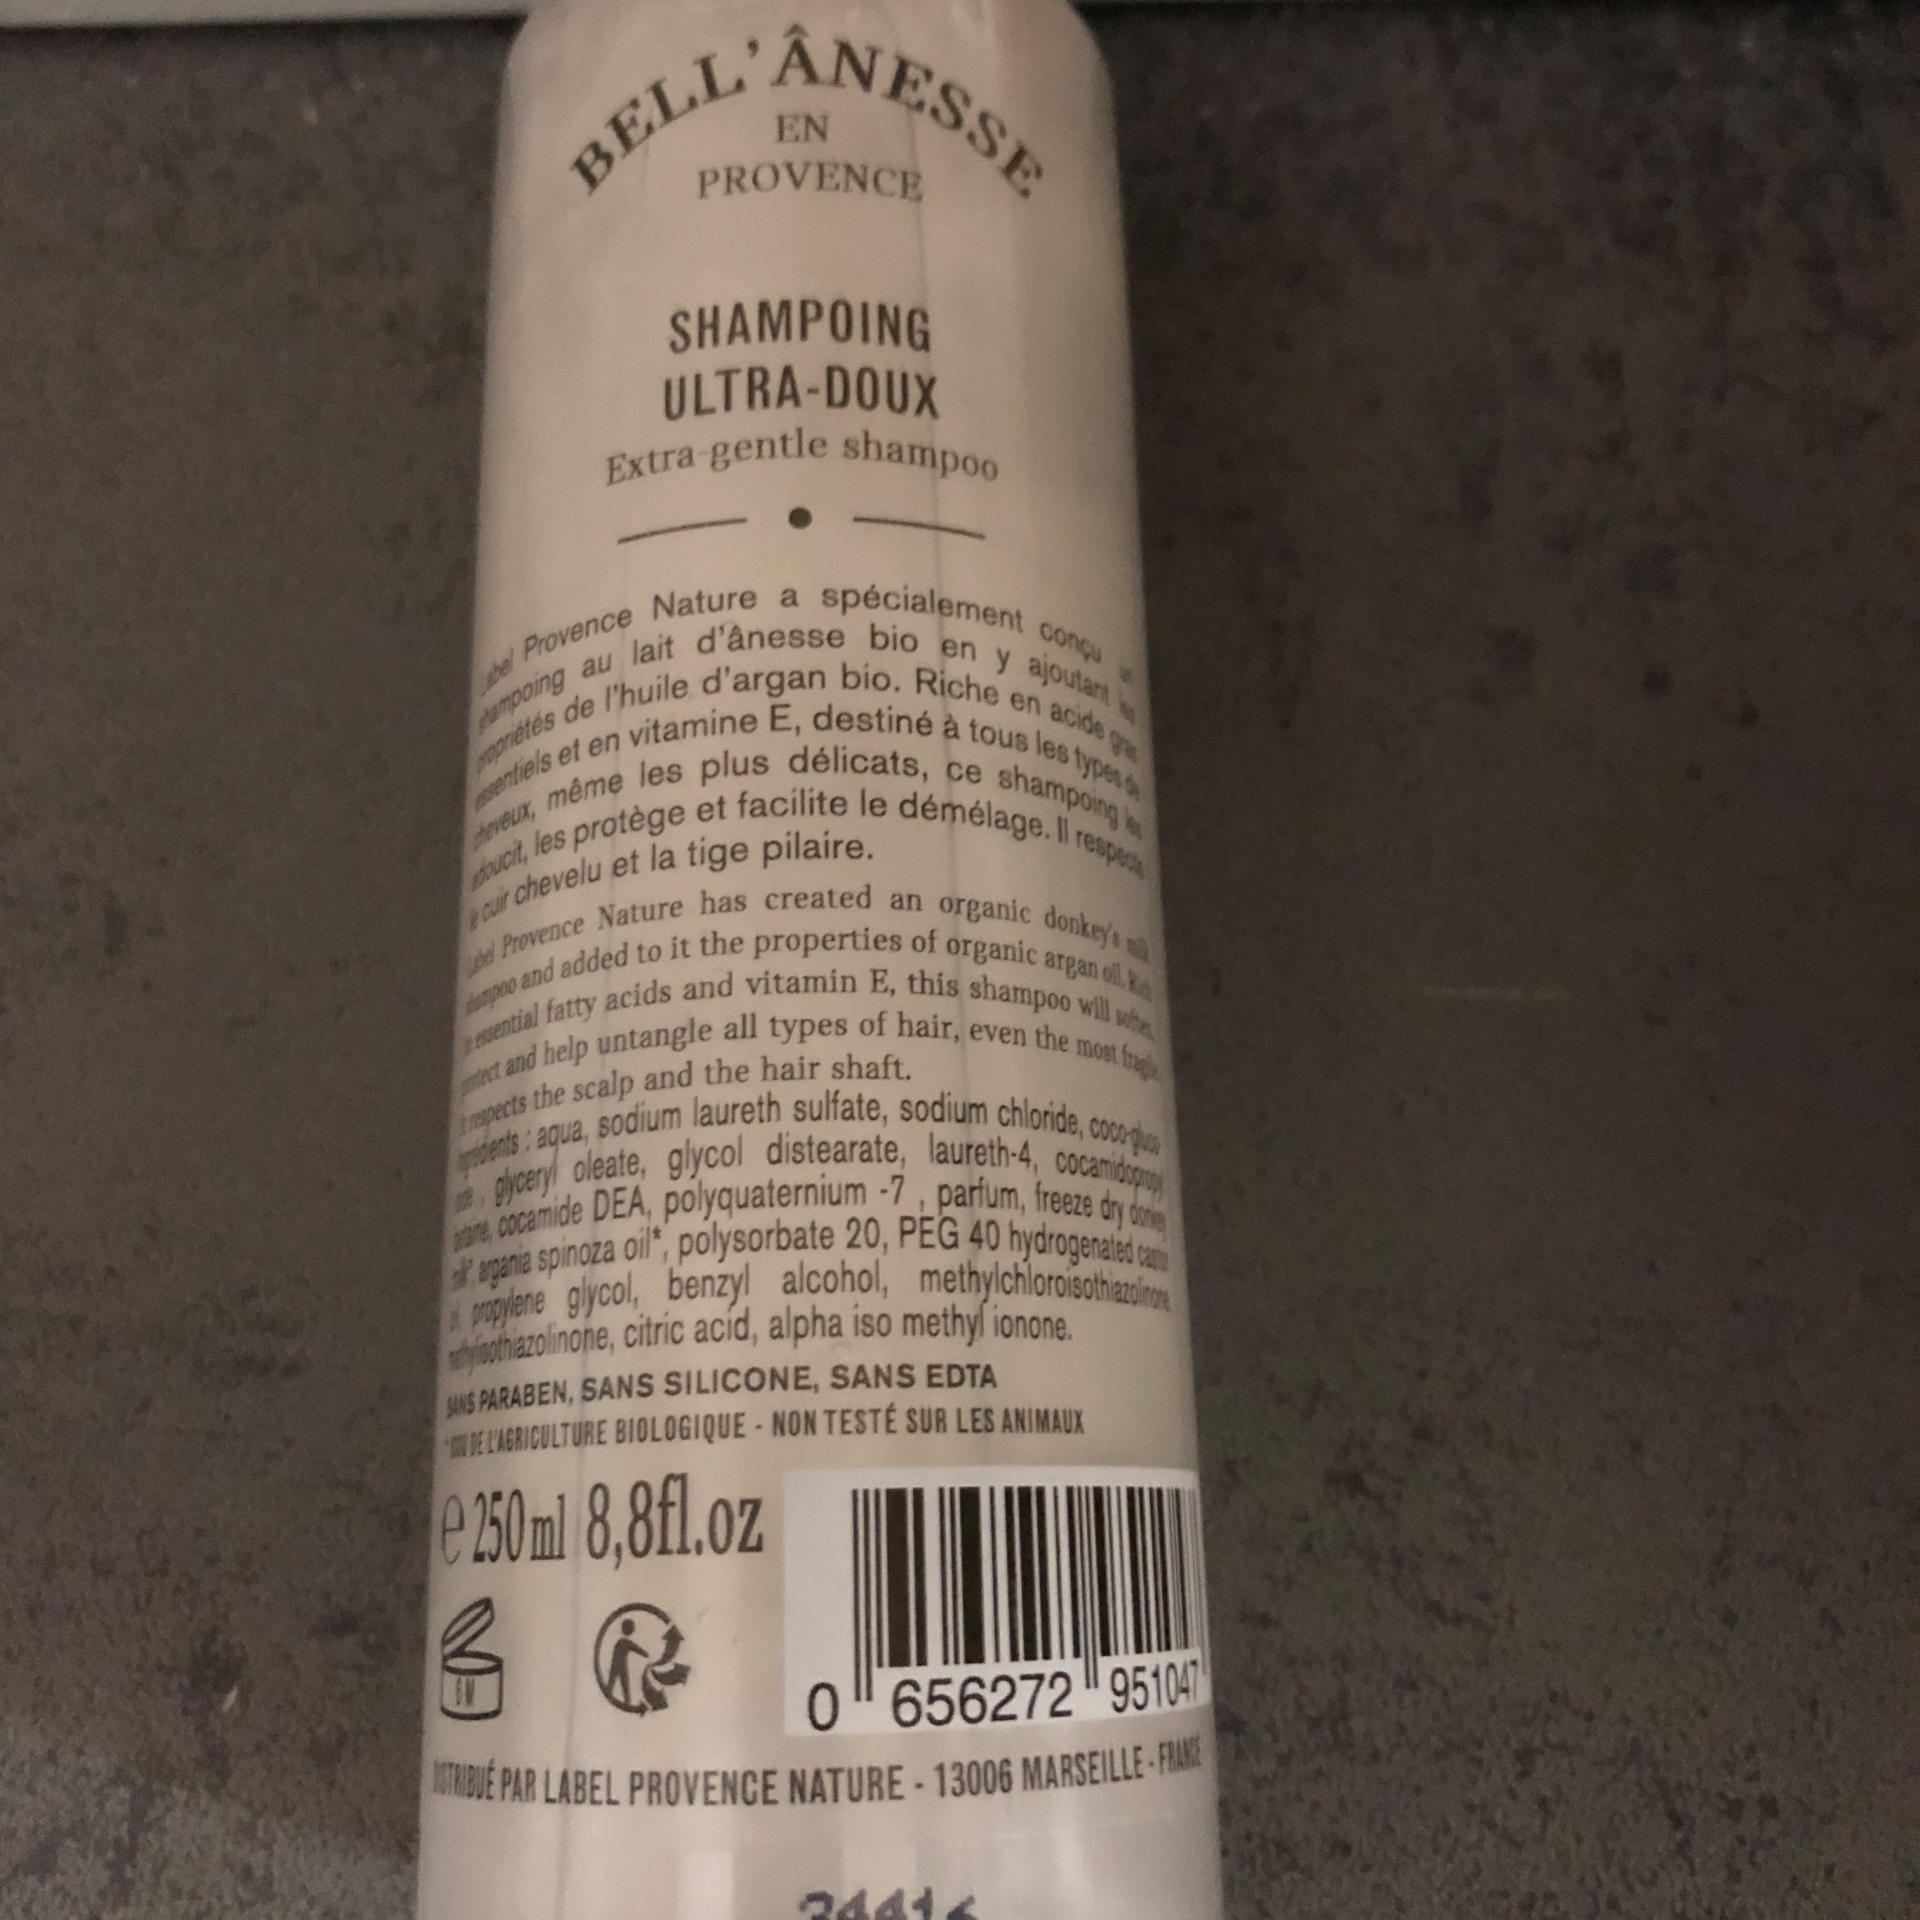 Shampooing lait d anesse composition